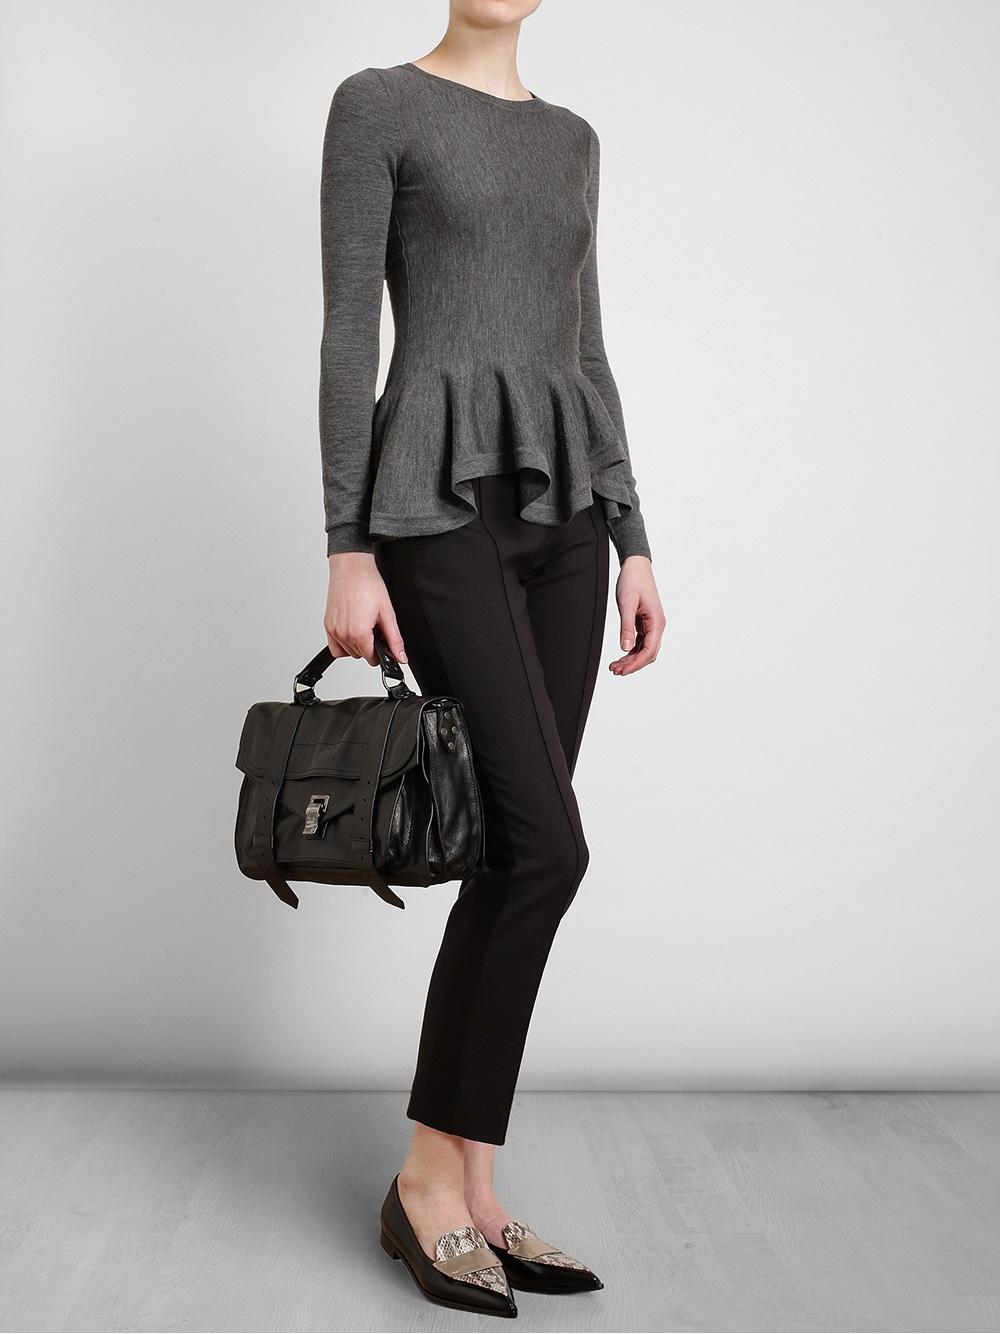 Proenza Schouler PS1+ Medium Leather Satchel Bag sehFu6nDZl